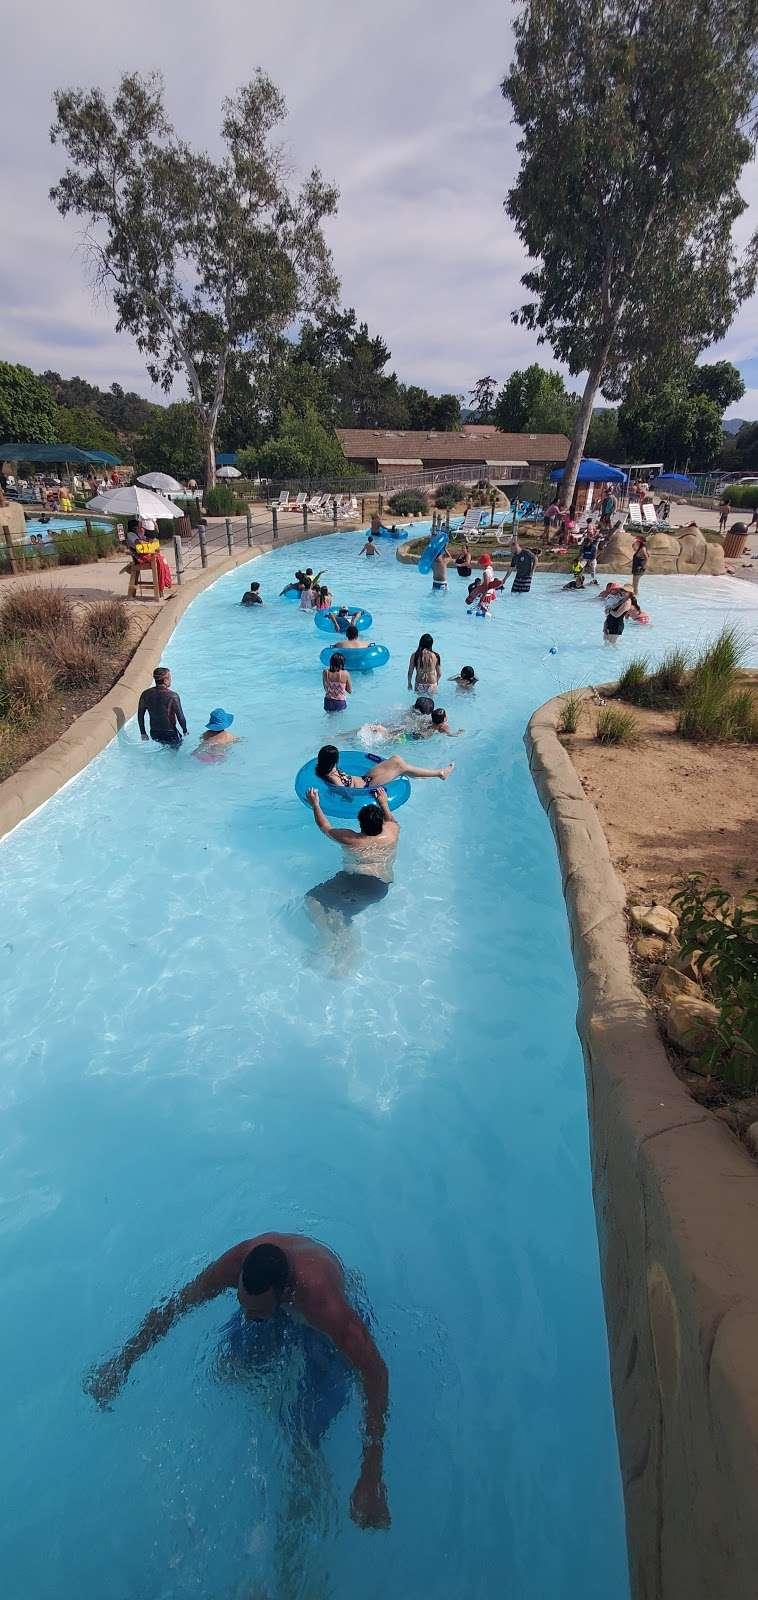 Lake Casitas Recreation Area - park  | Photo 4 of 10 | Address: 11311 Santa Ana Rd, Ventura, CA 93001, USA | Phone: (805) 649-1122